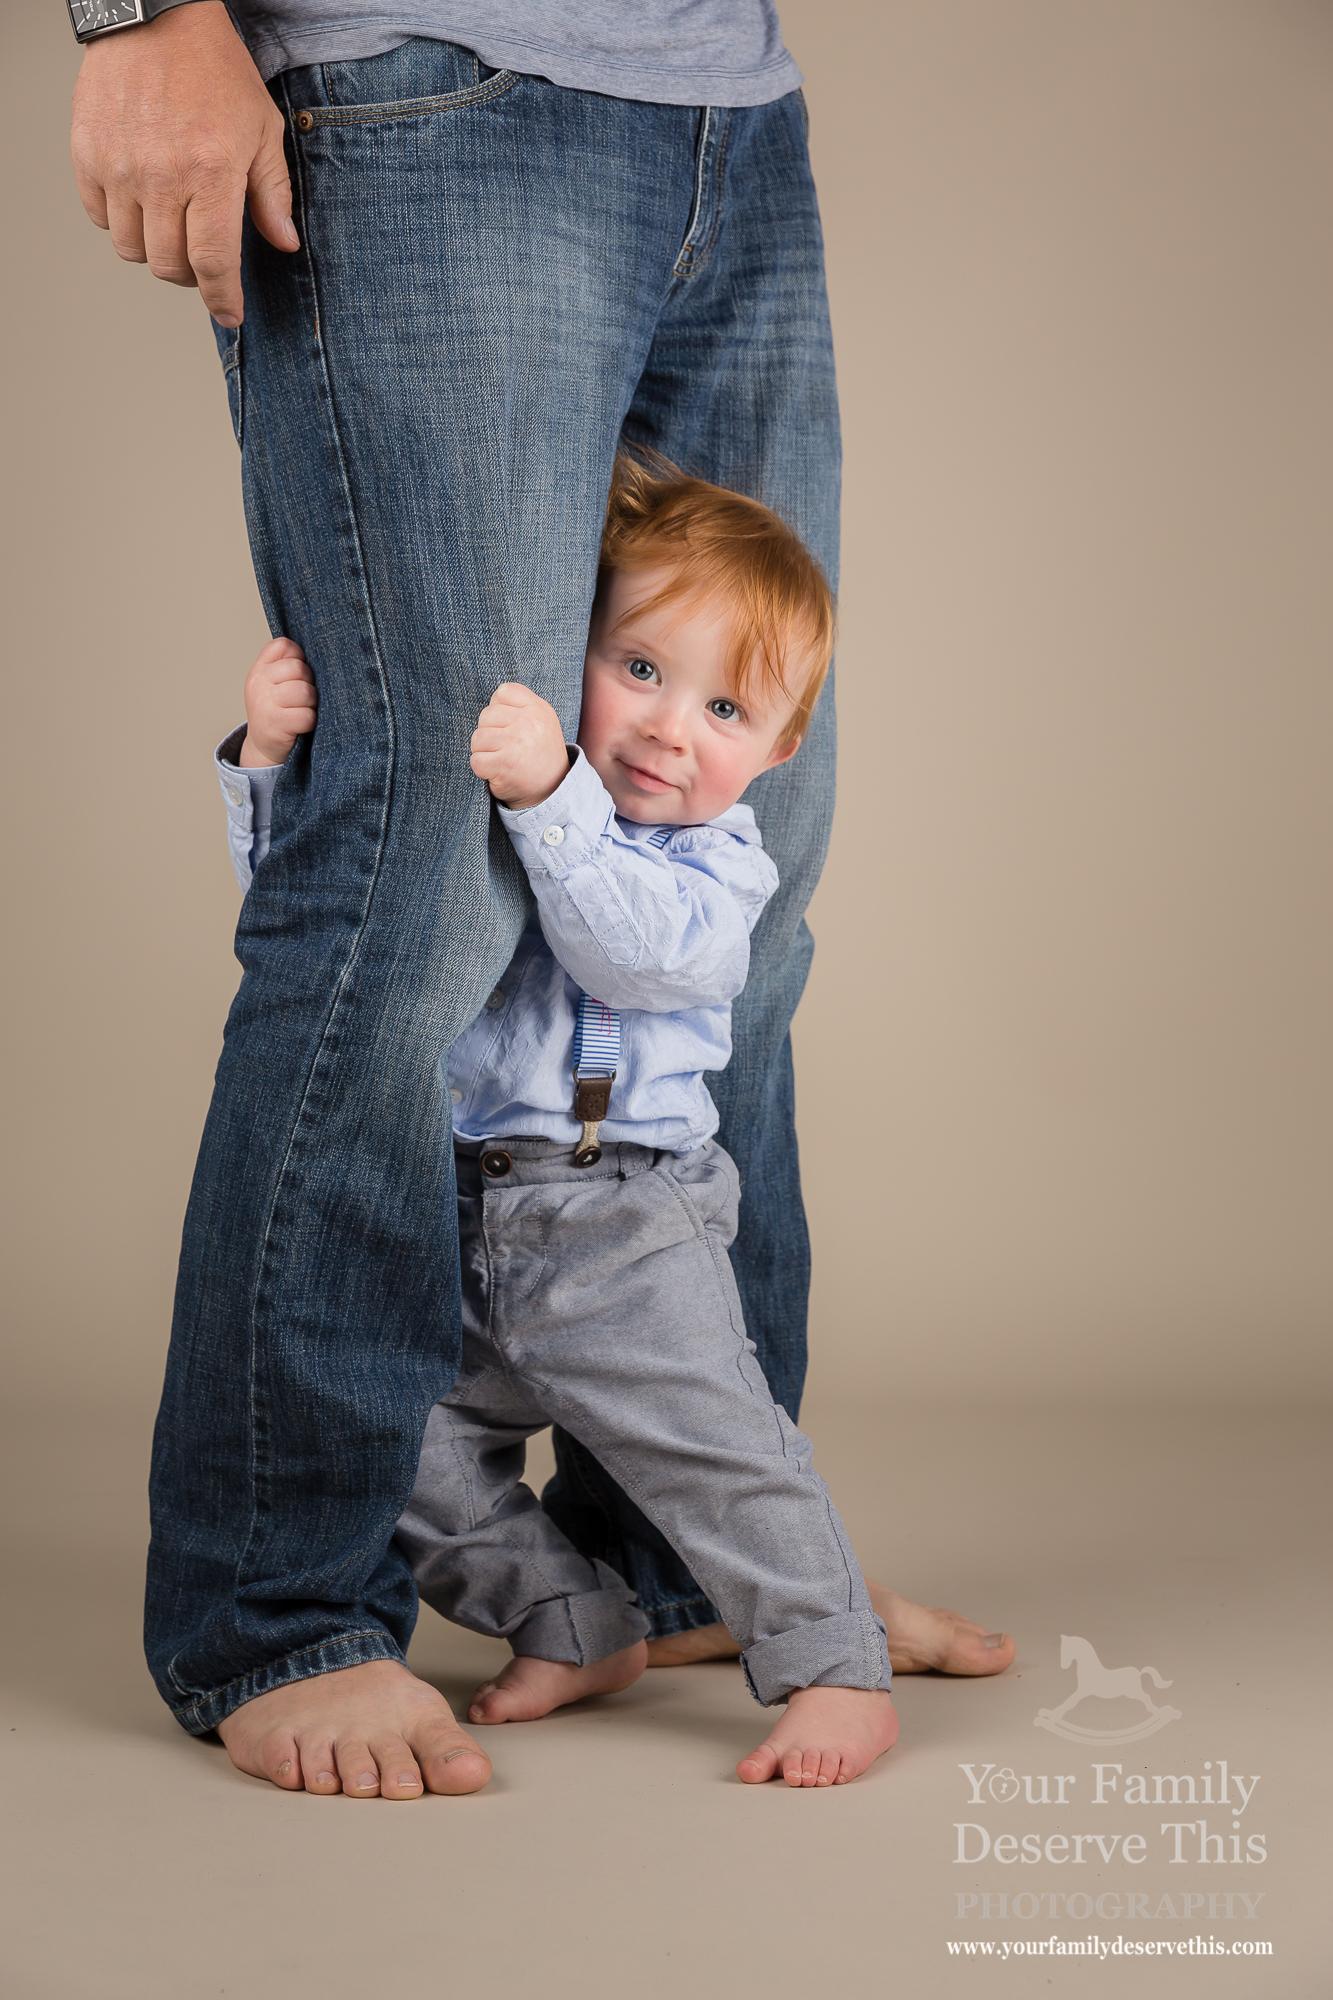 Marking milestones and creating memories to last forever.  yourfamilydeservethis.com